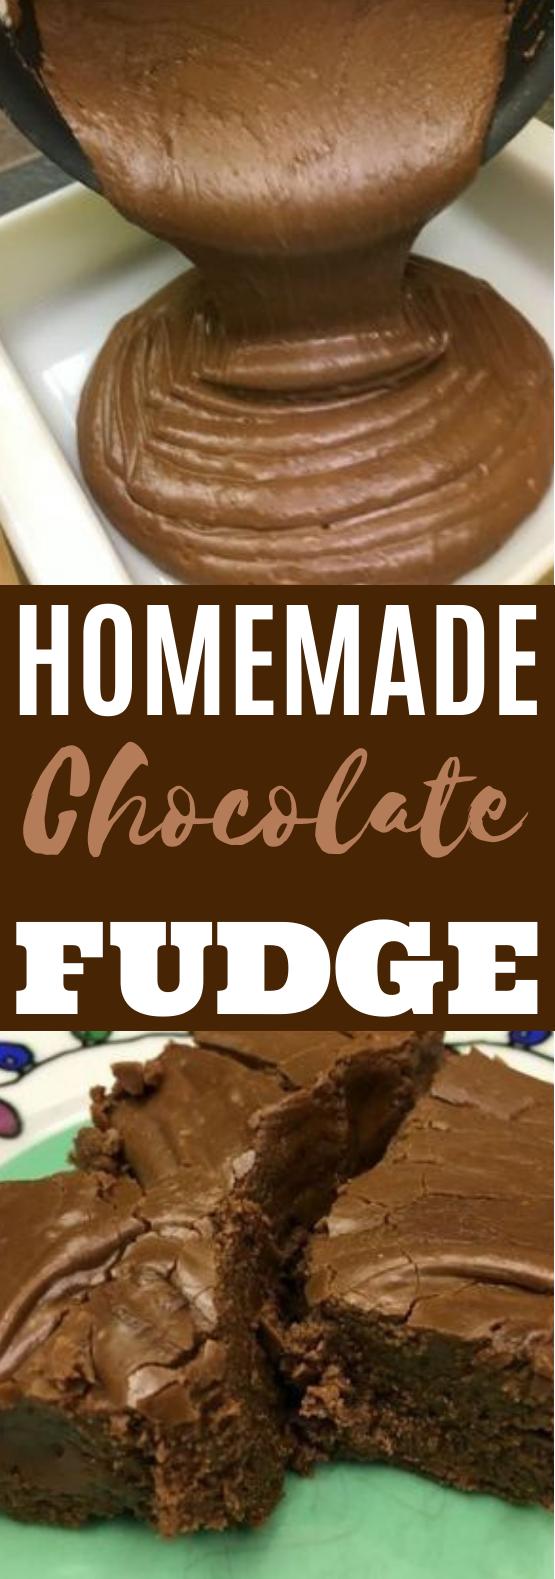 Homemade Chocolate Fudge #chocolate #desserts